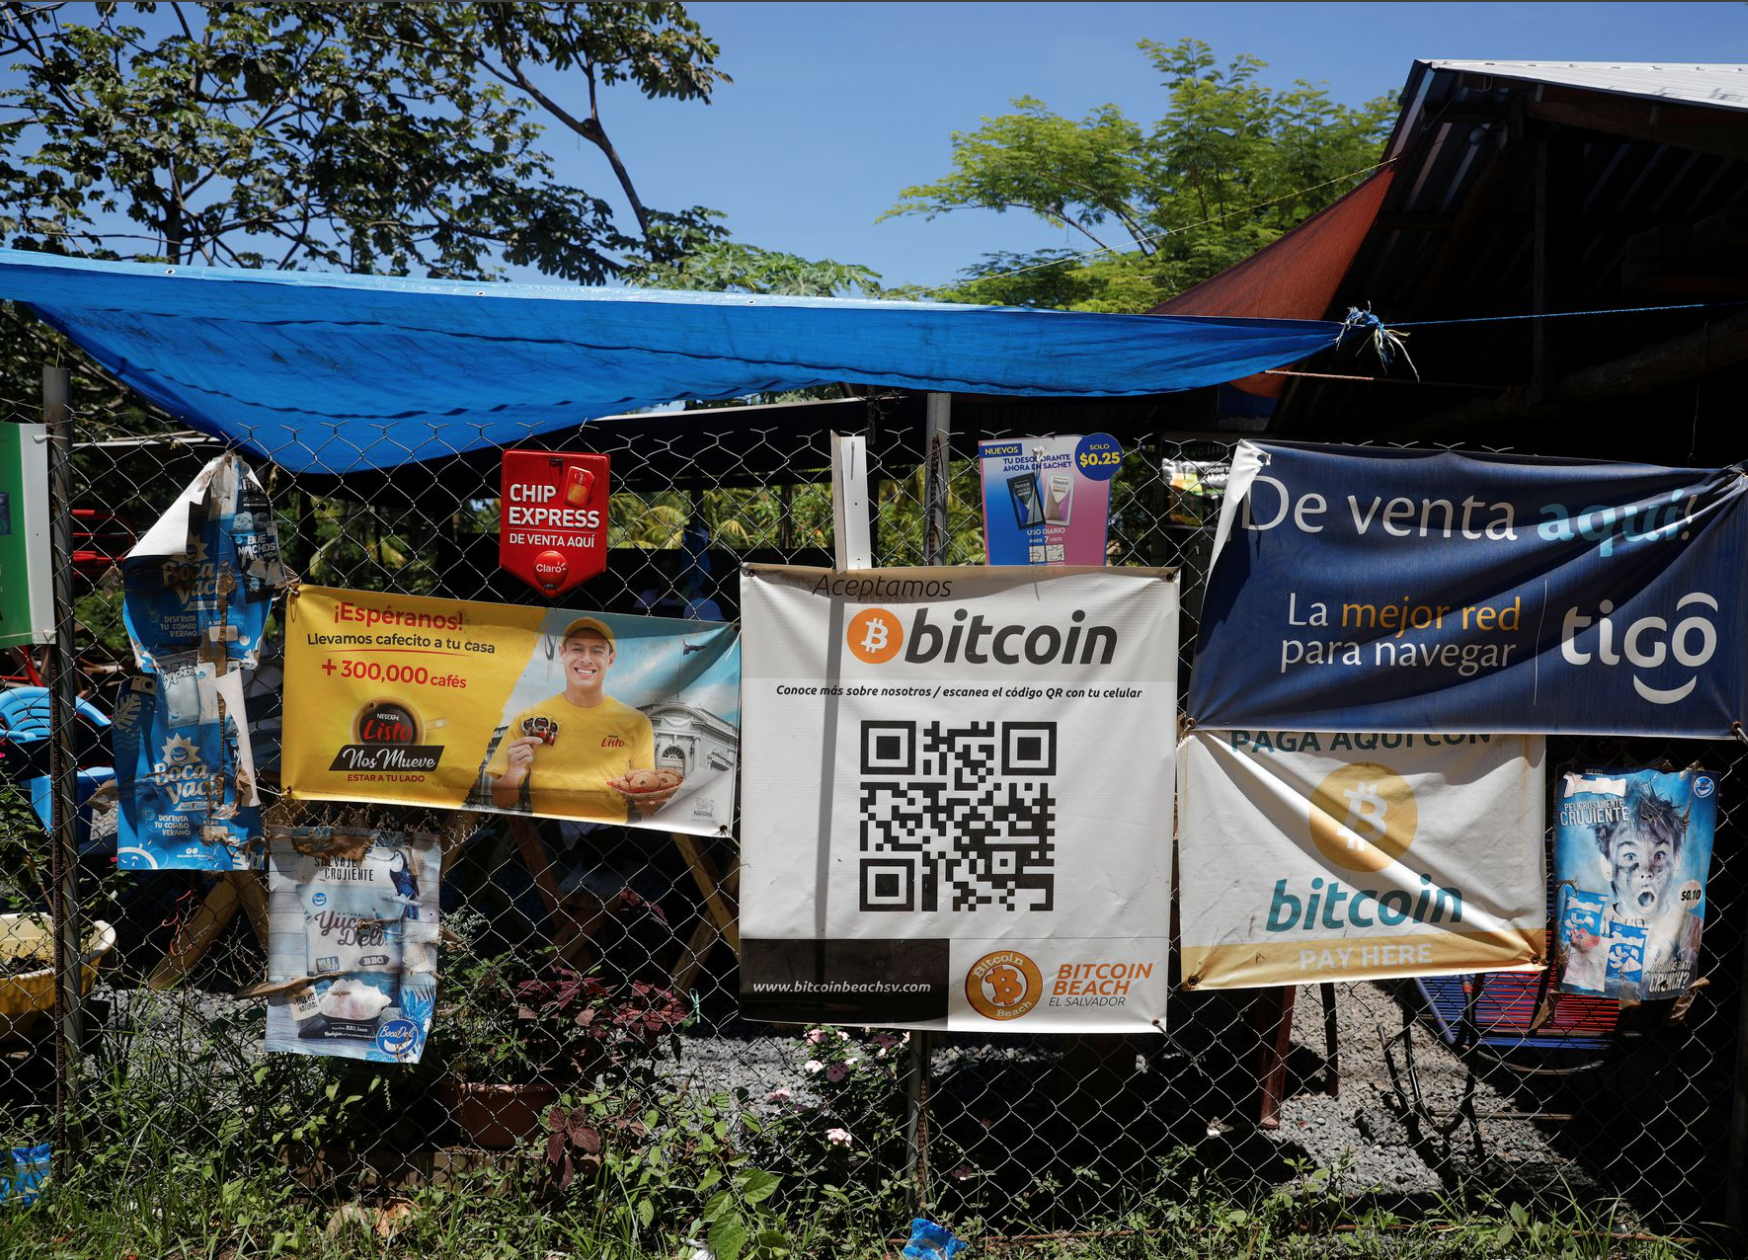 Verplichte Bitcoin acceptatie in Salvador